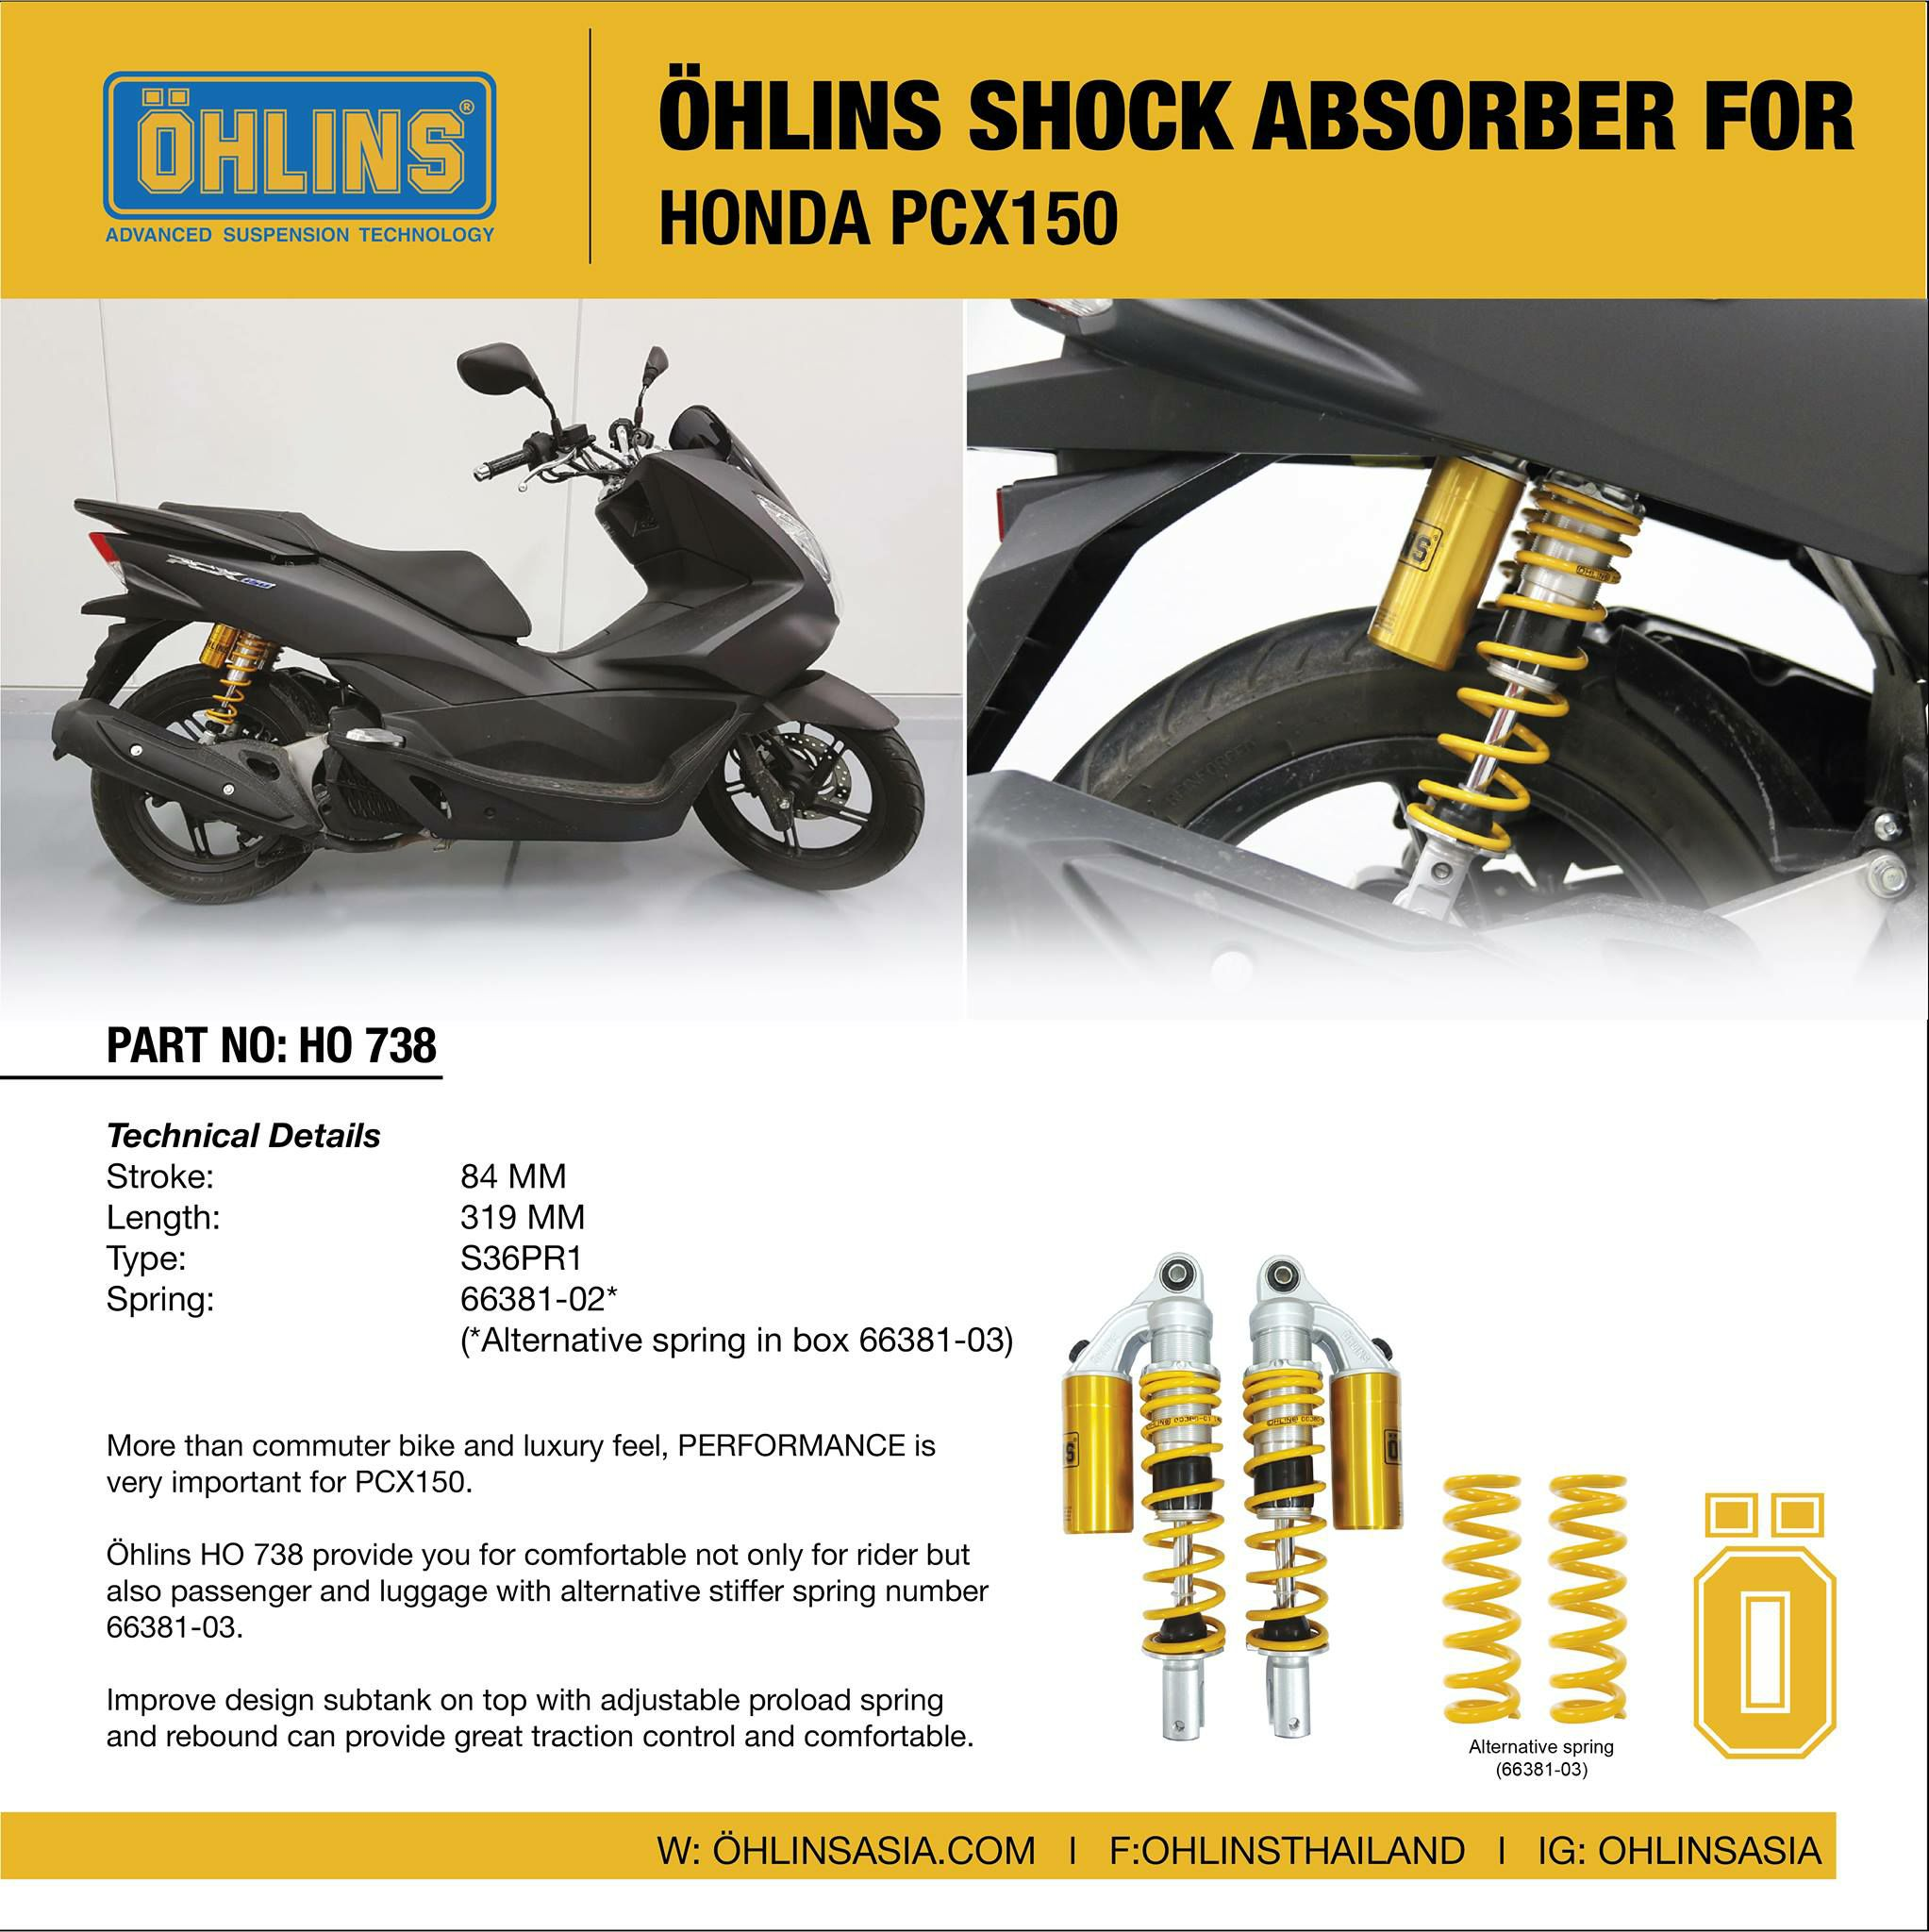 Ohlins Rear Shock For HONDA PCX150 Subtank on top